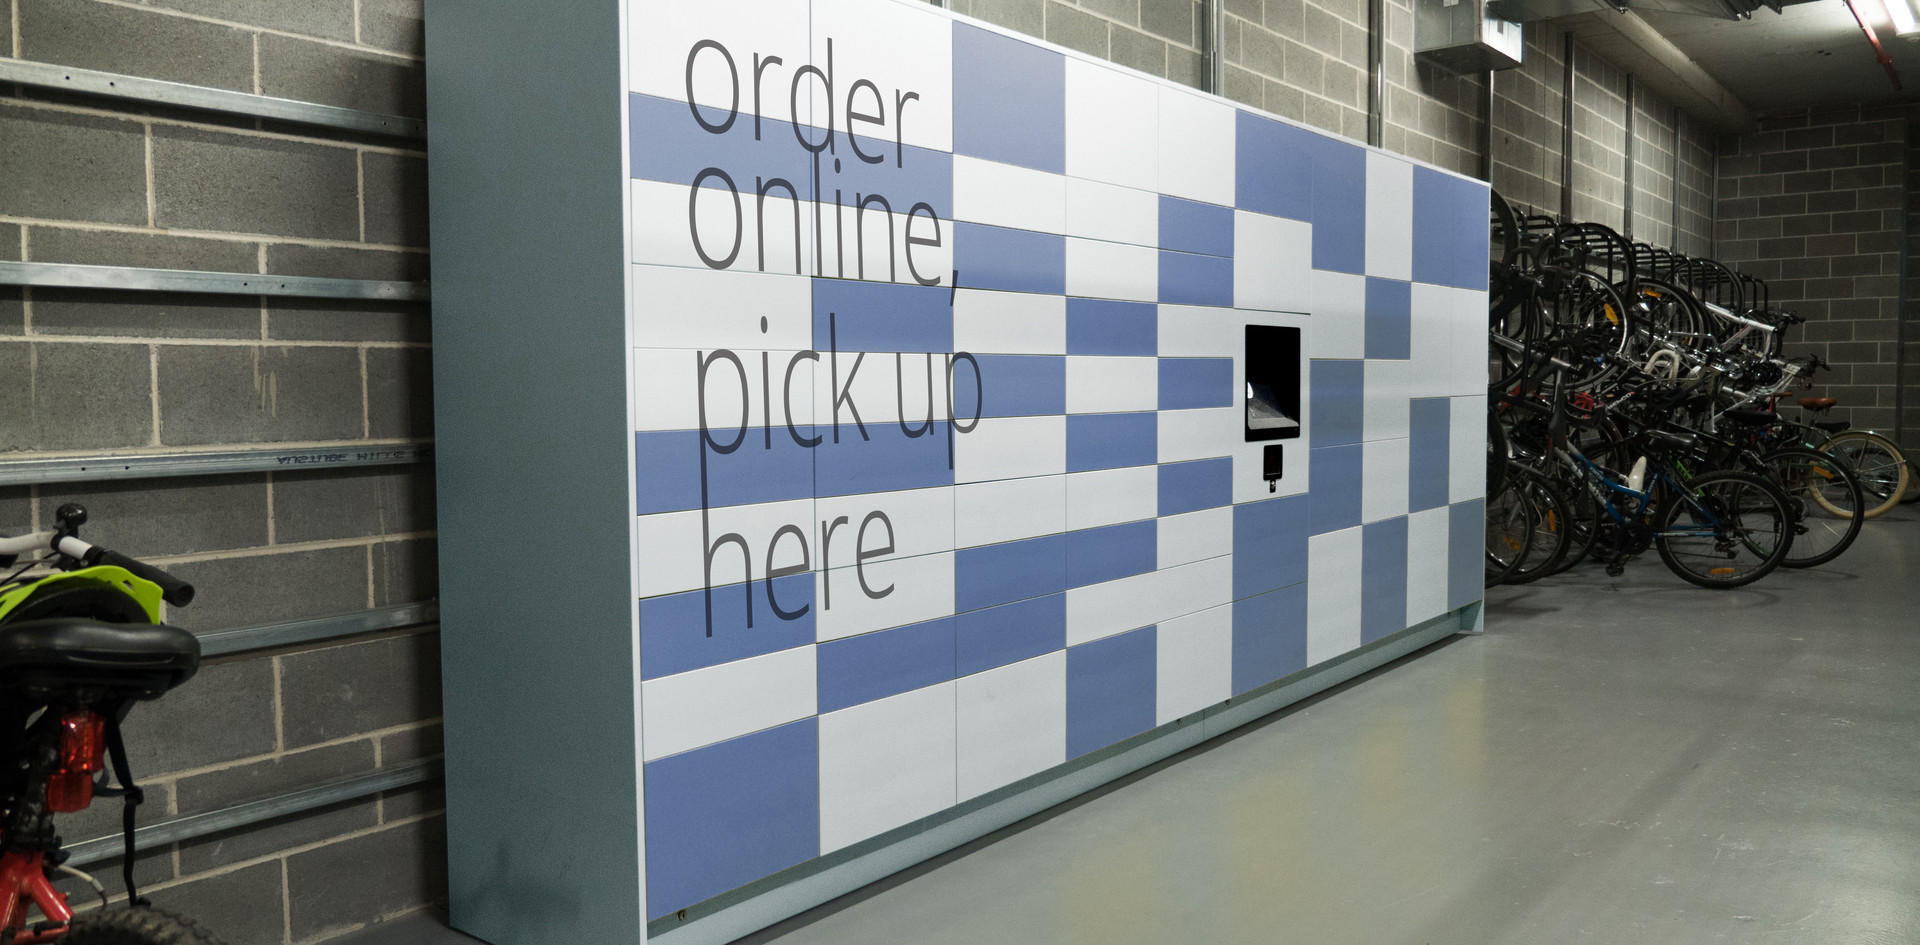 parcel pickup public access lockers screen access